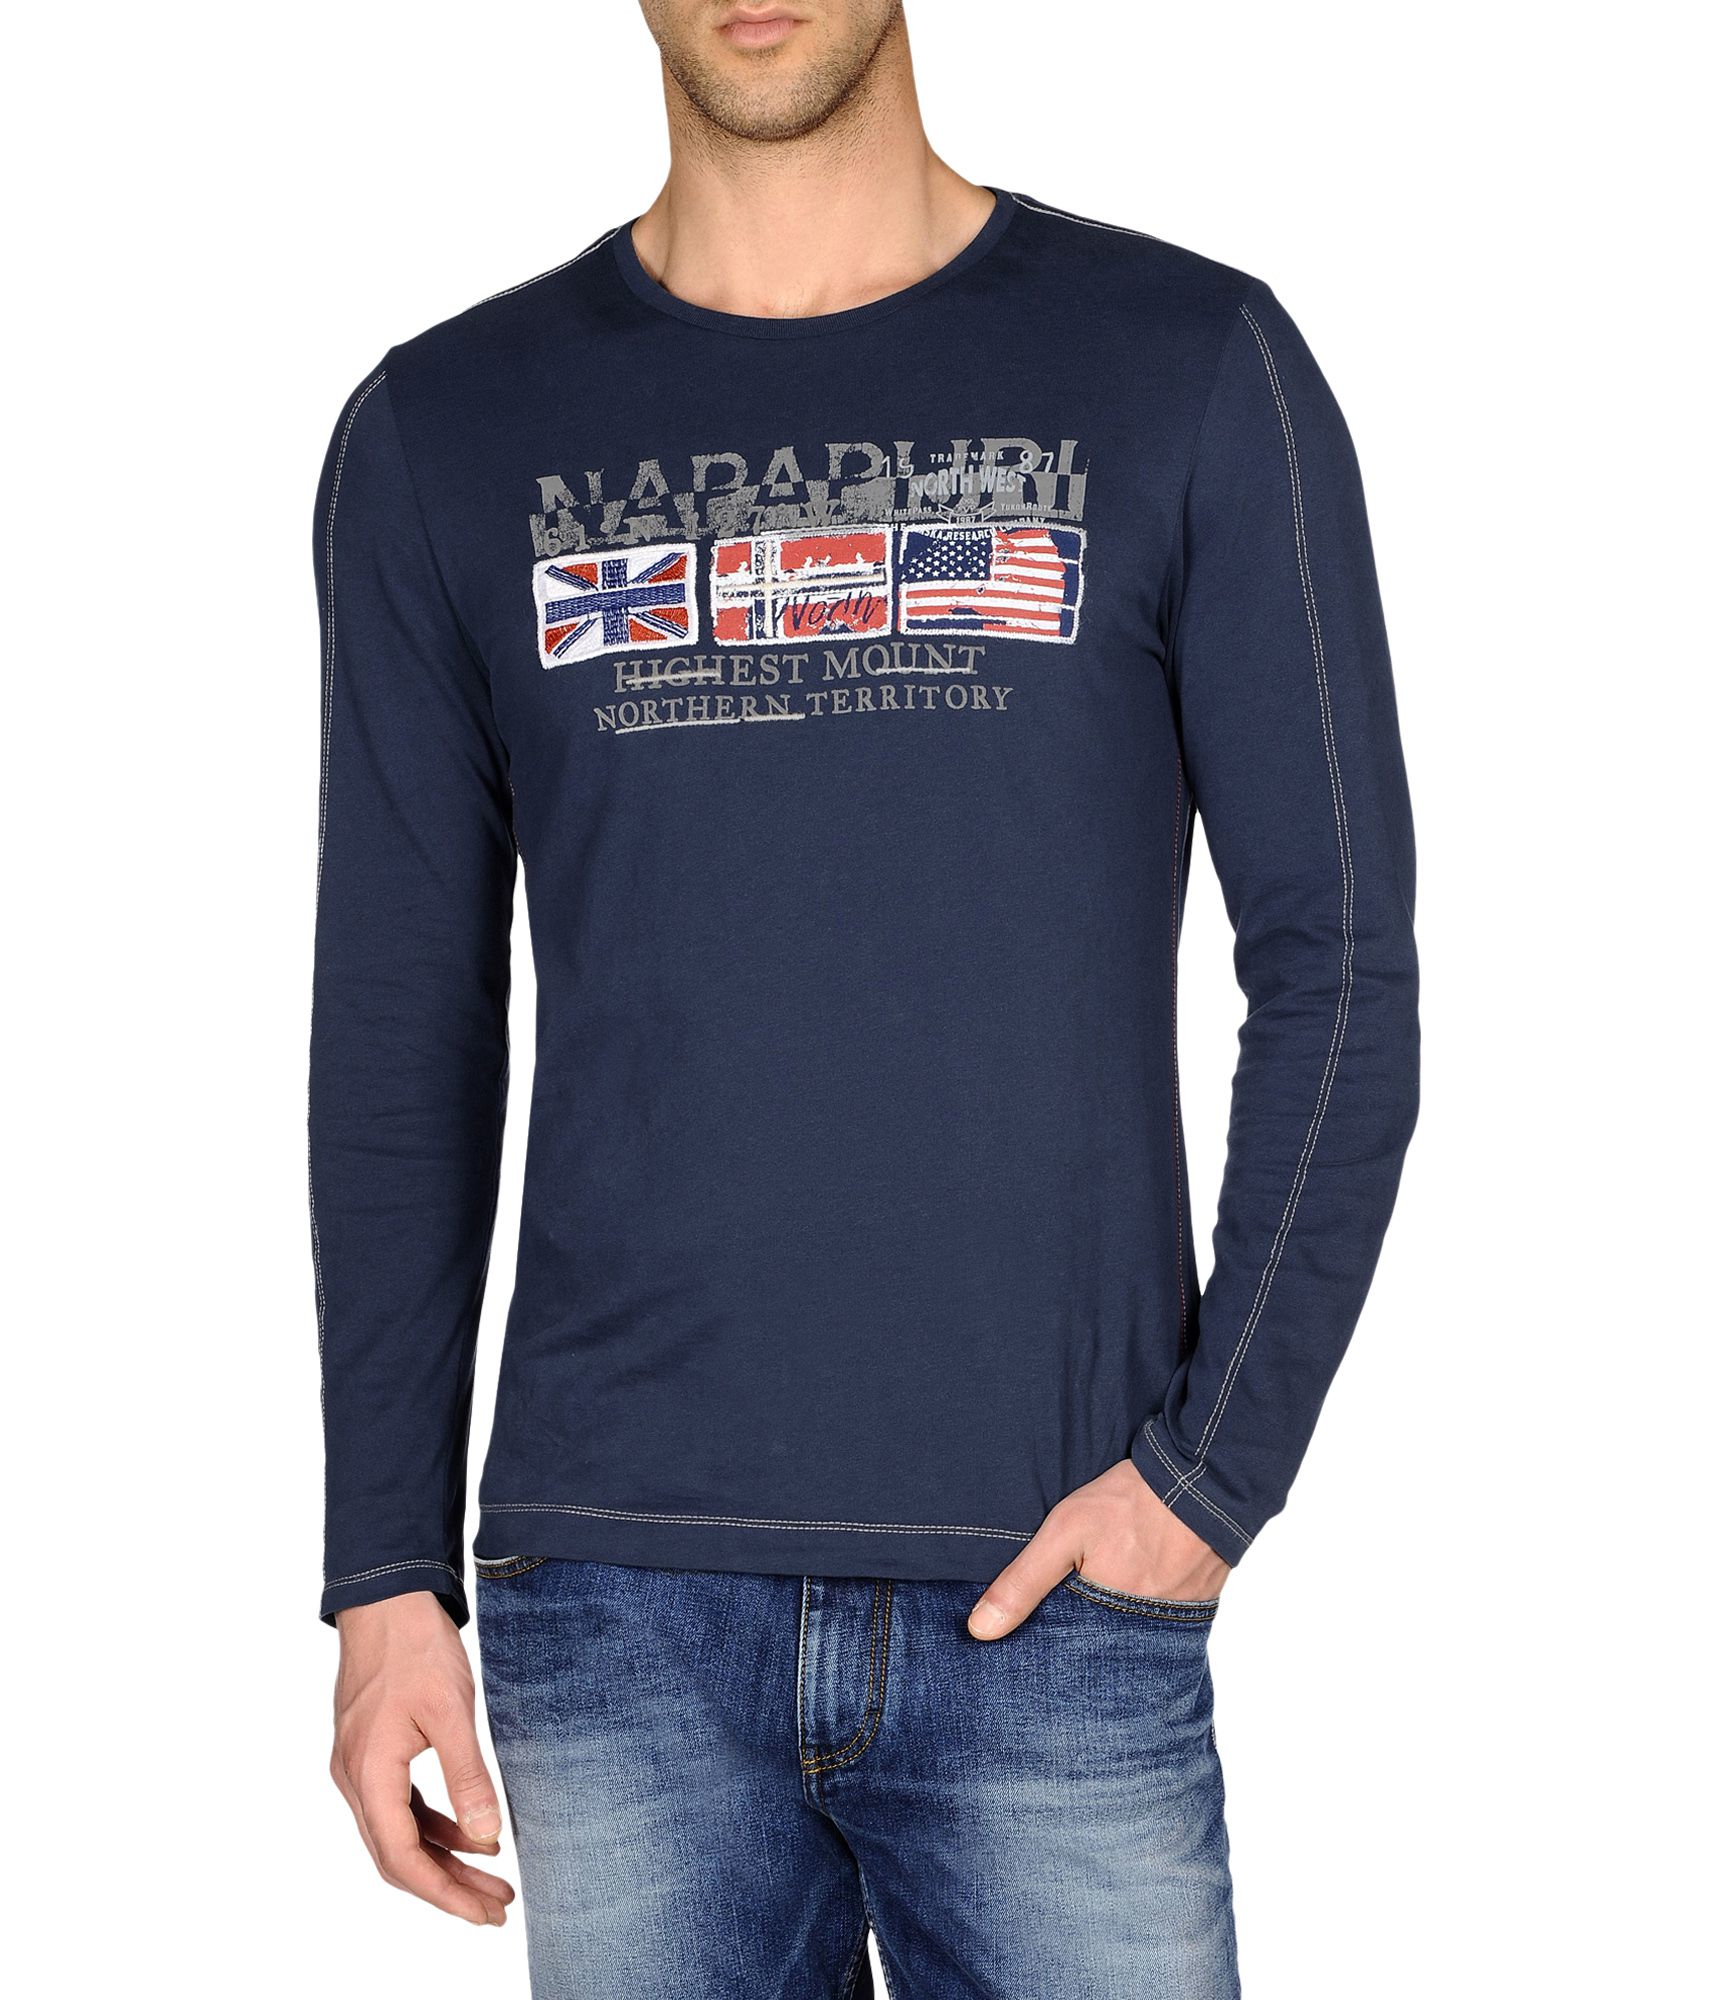 napapijri long sleeve t shirt in blue for men lyst. Black Bedroom Furniture Sets. Home Design Ideas